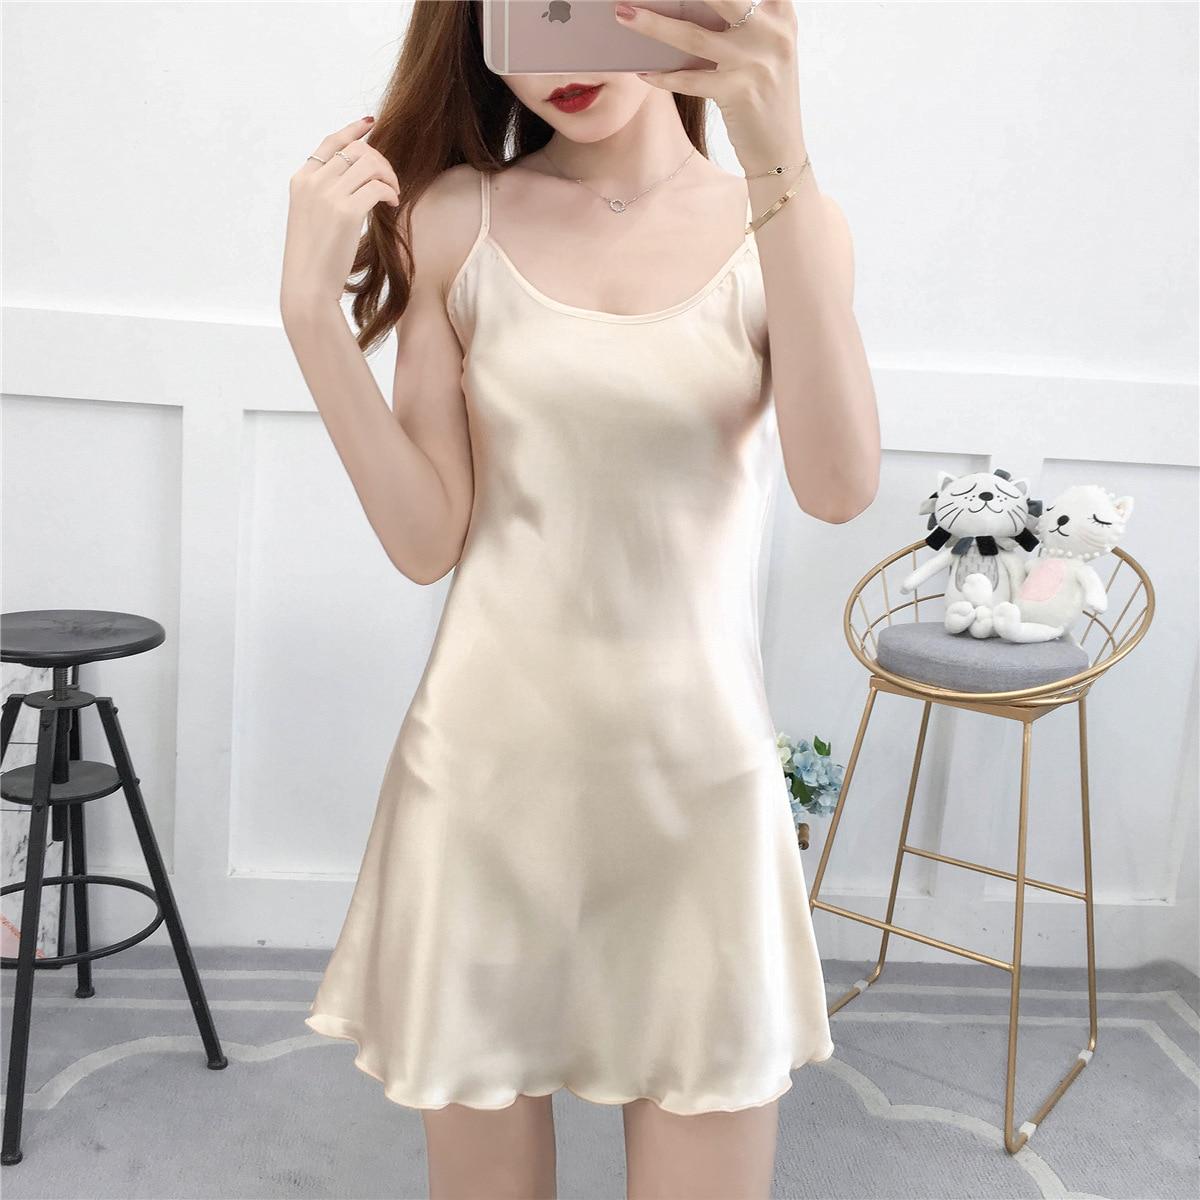 3XL Women Nightwear Summer Nightie Sleeveless Home Dress Satin Nightdress Nightgown Sexy Sleepwear Sleepshirt Plus Size